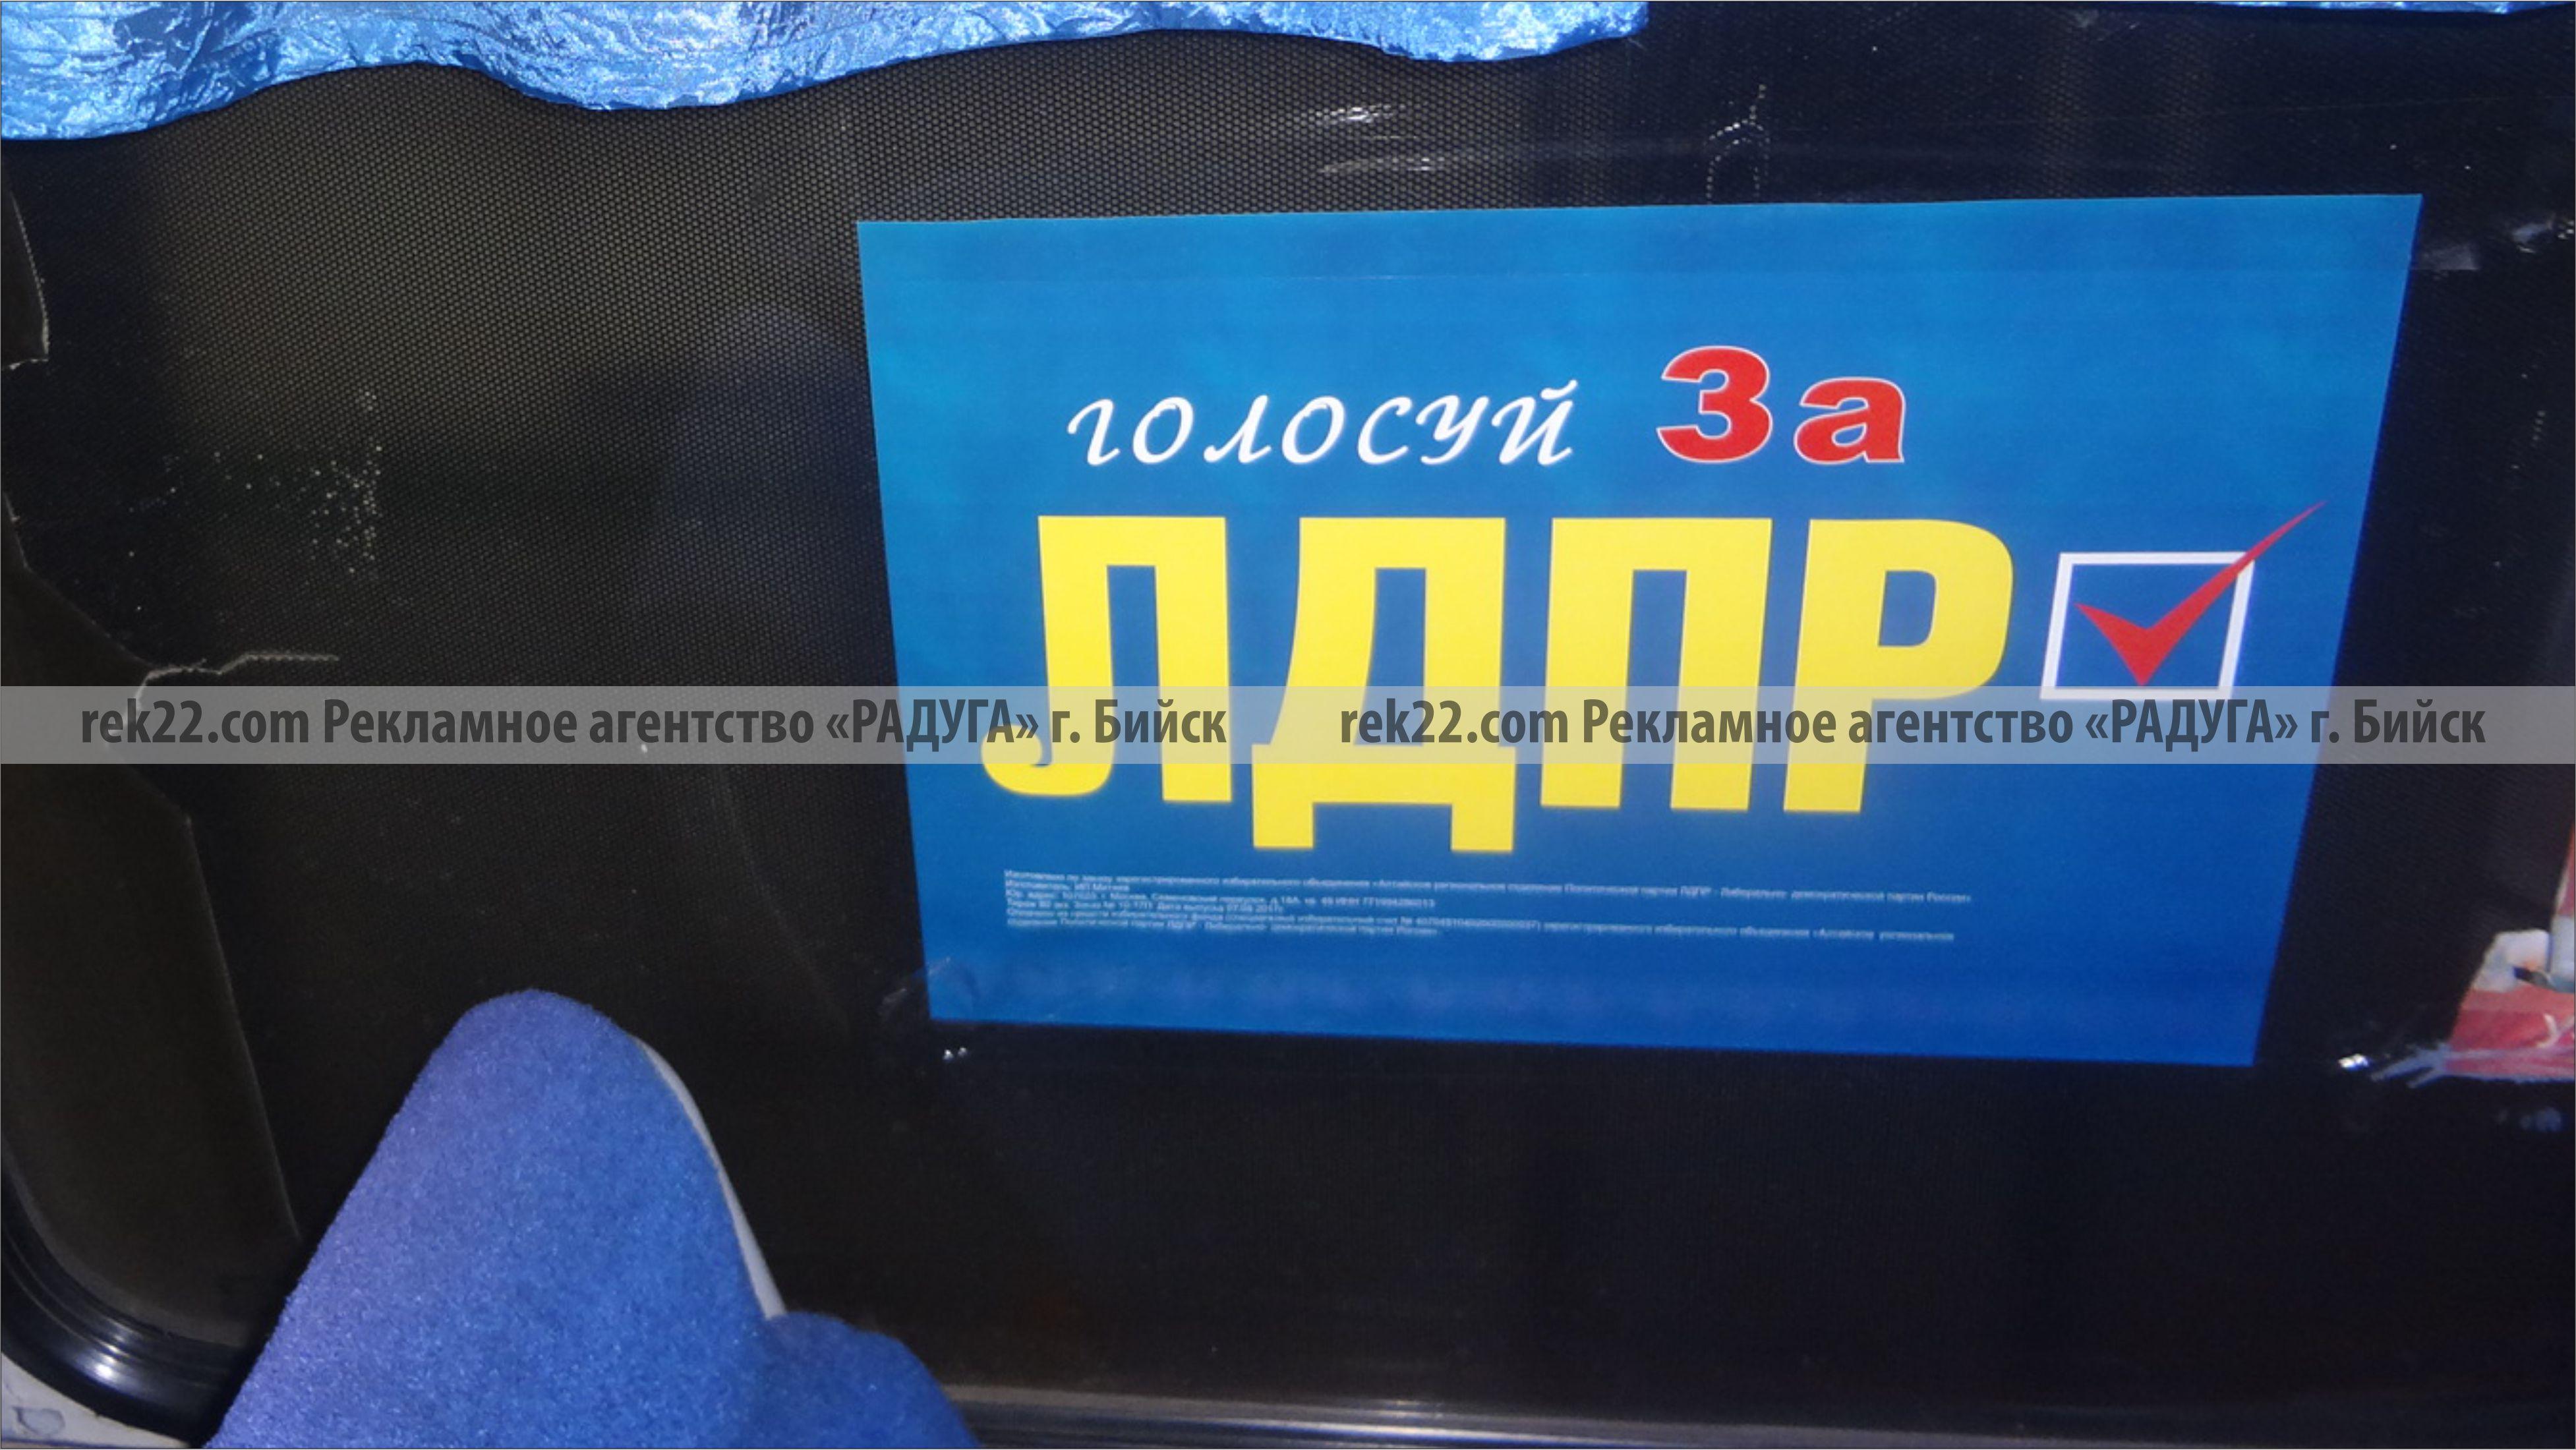 Реклама на транспорте Бийск - листовки - 2.1